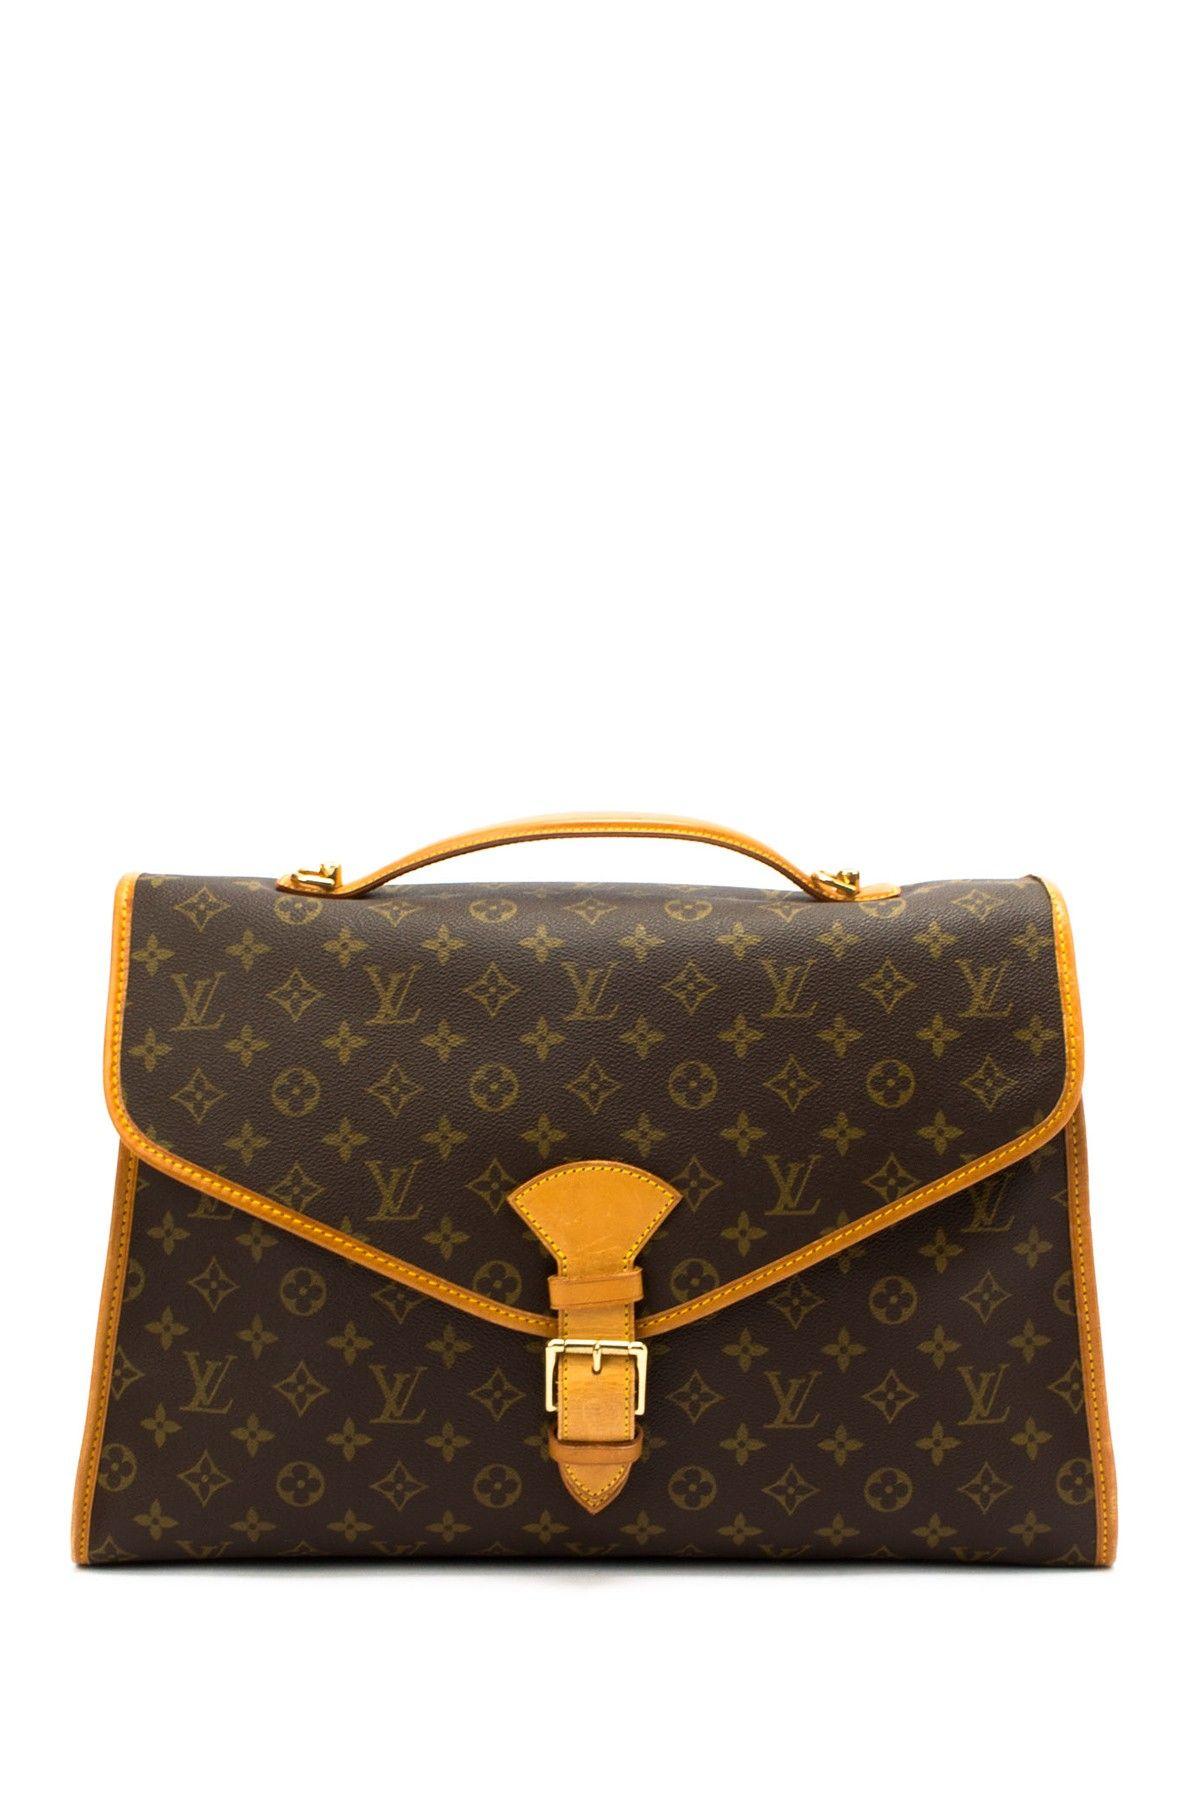 vintage Louis Vuitton  3 (fyi... vintage LV sale on now at HauteLook 9 20) 5a9f65a7ef